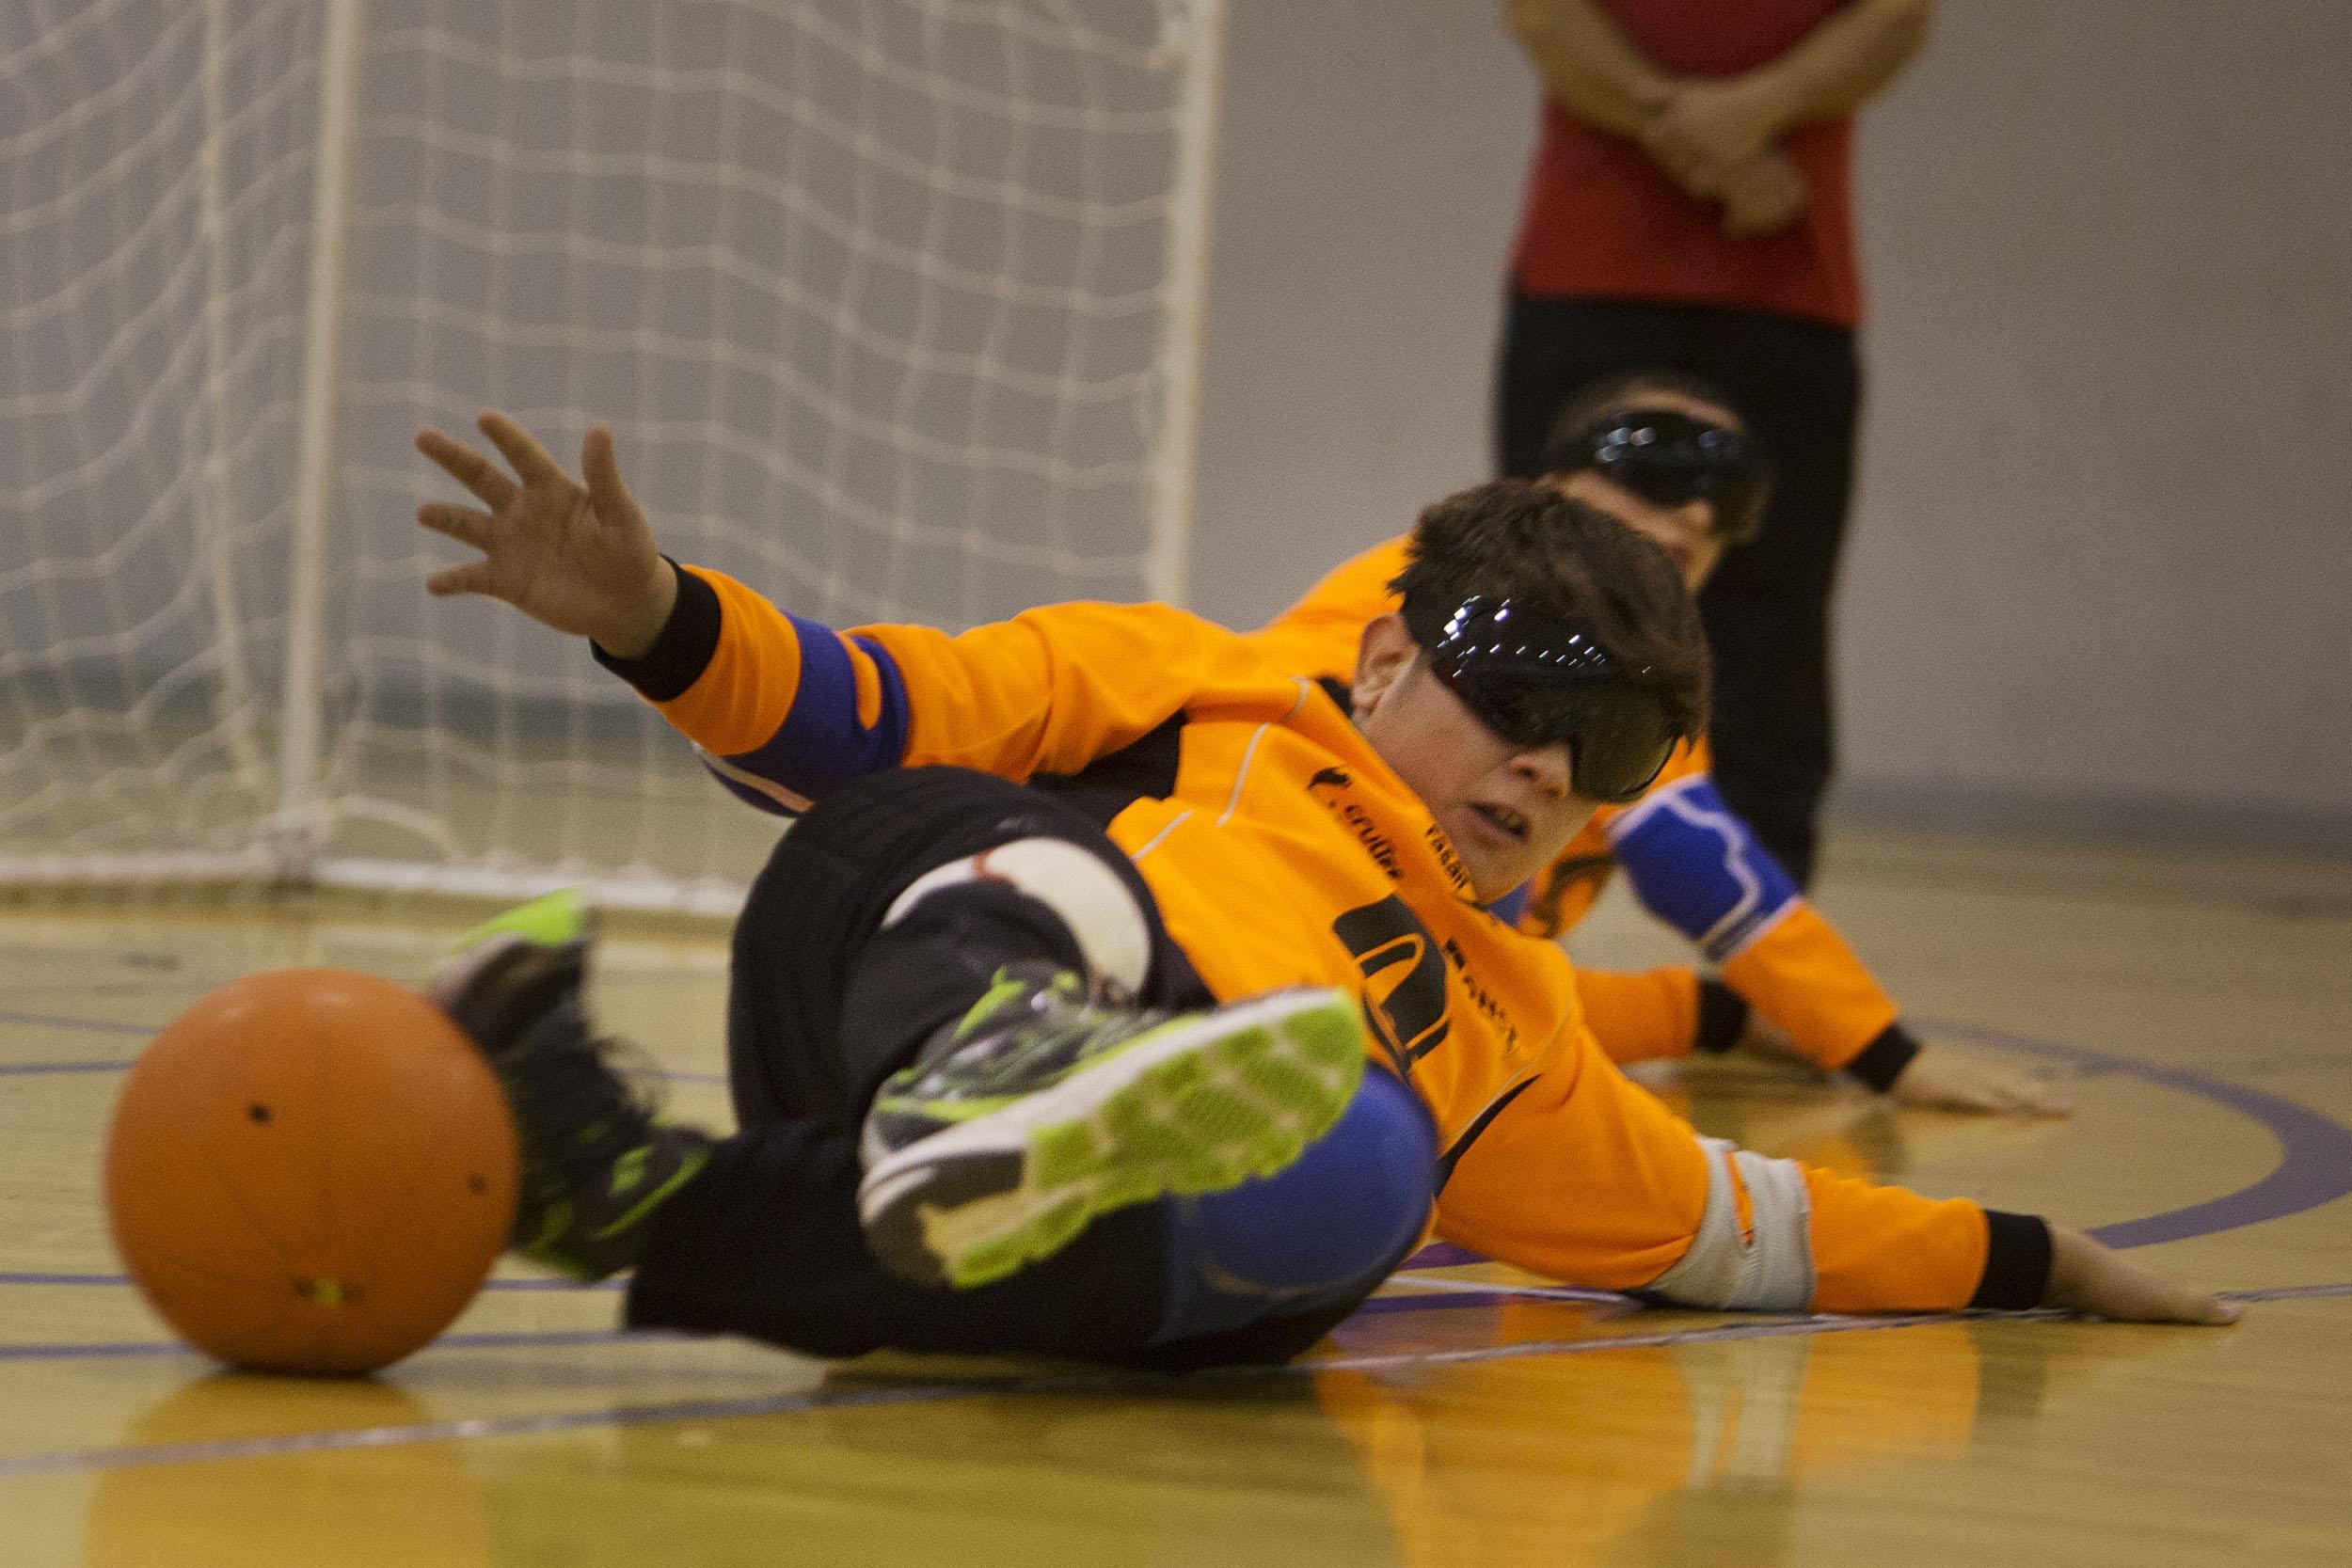 El CRE de Sevilla volverá a acoger un campeonato de Goalball de Andalucía